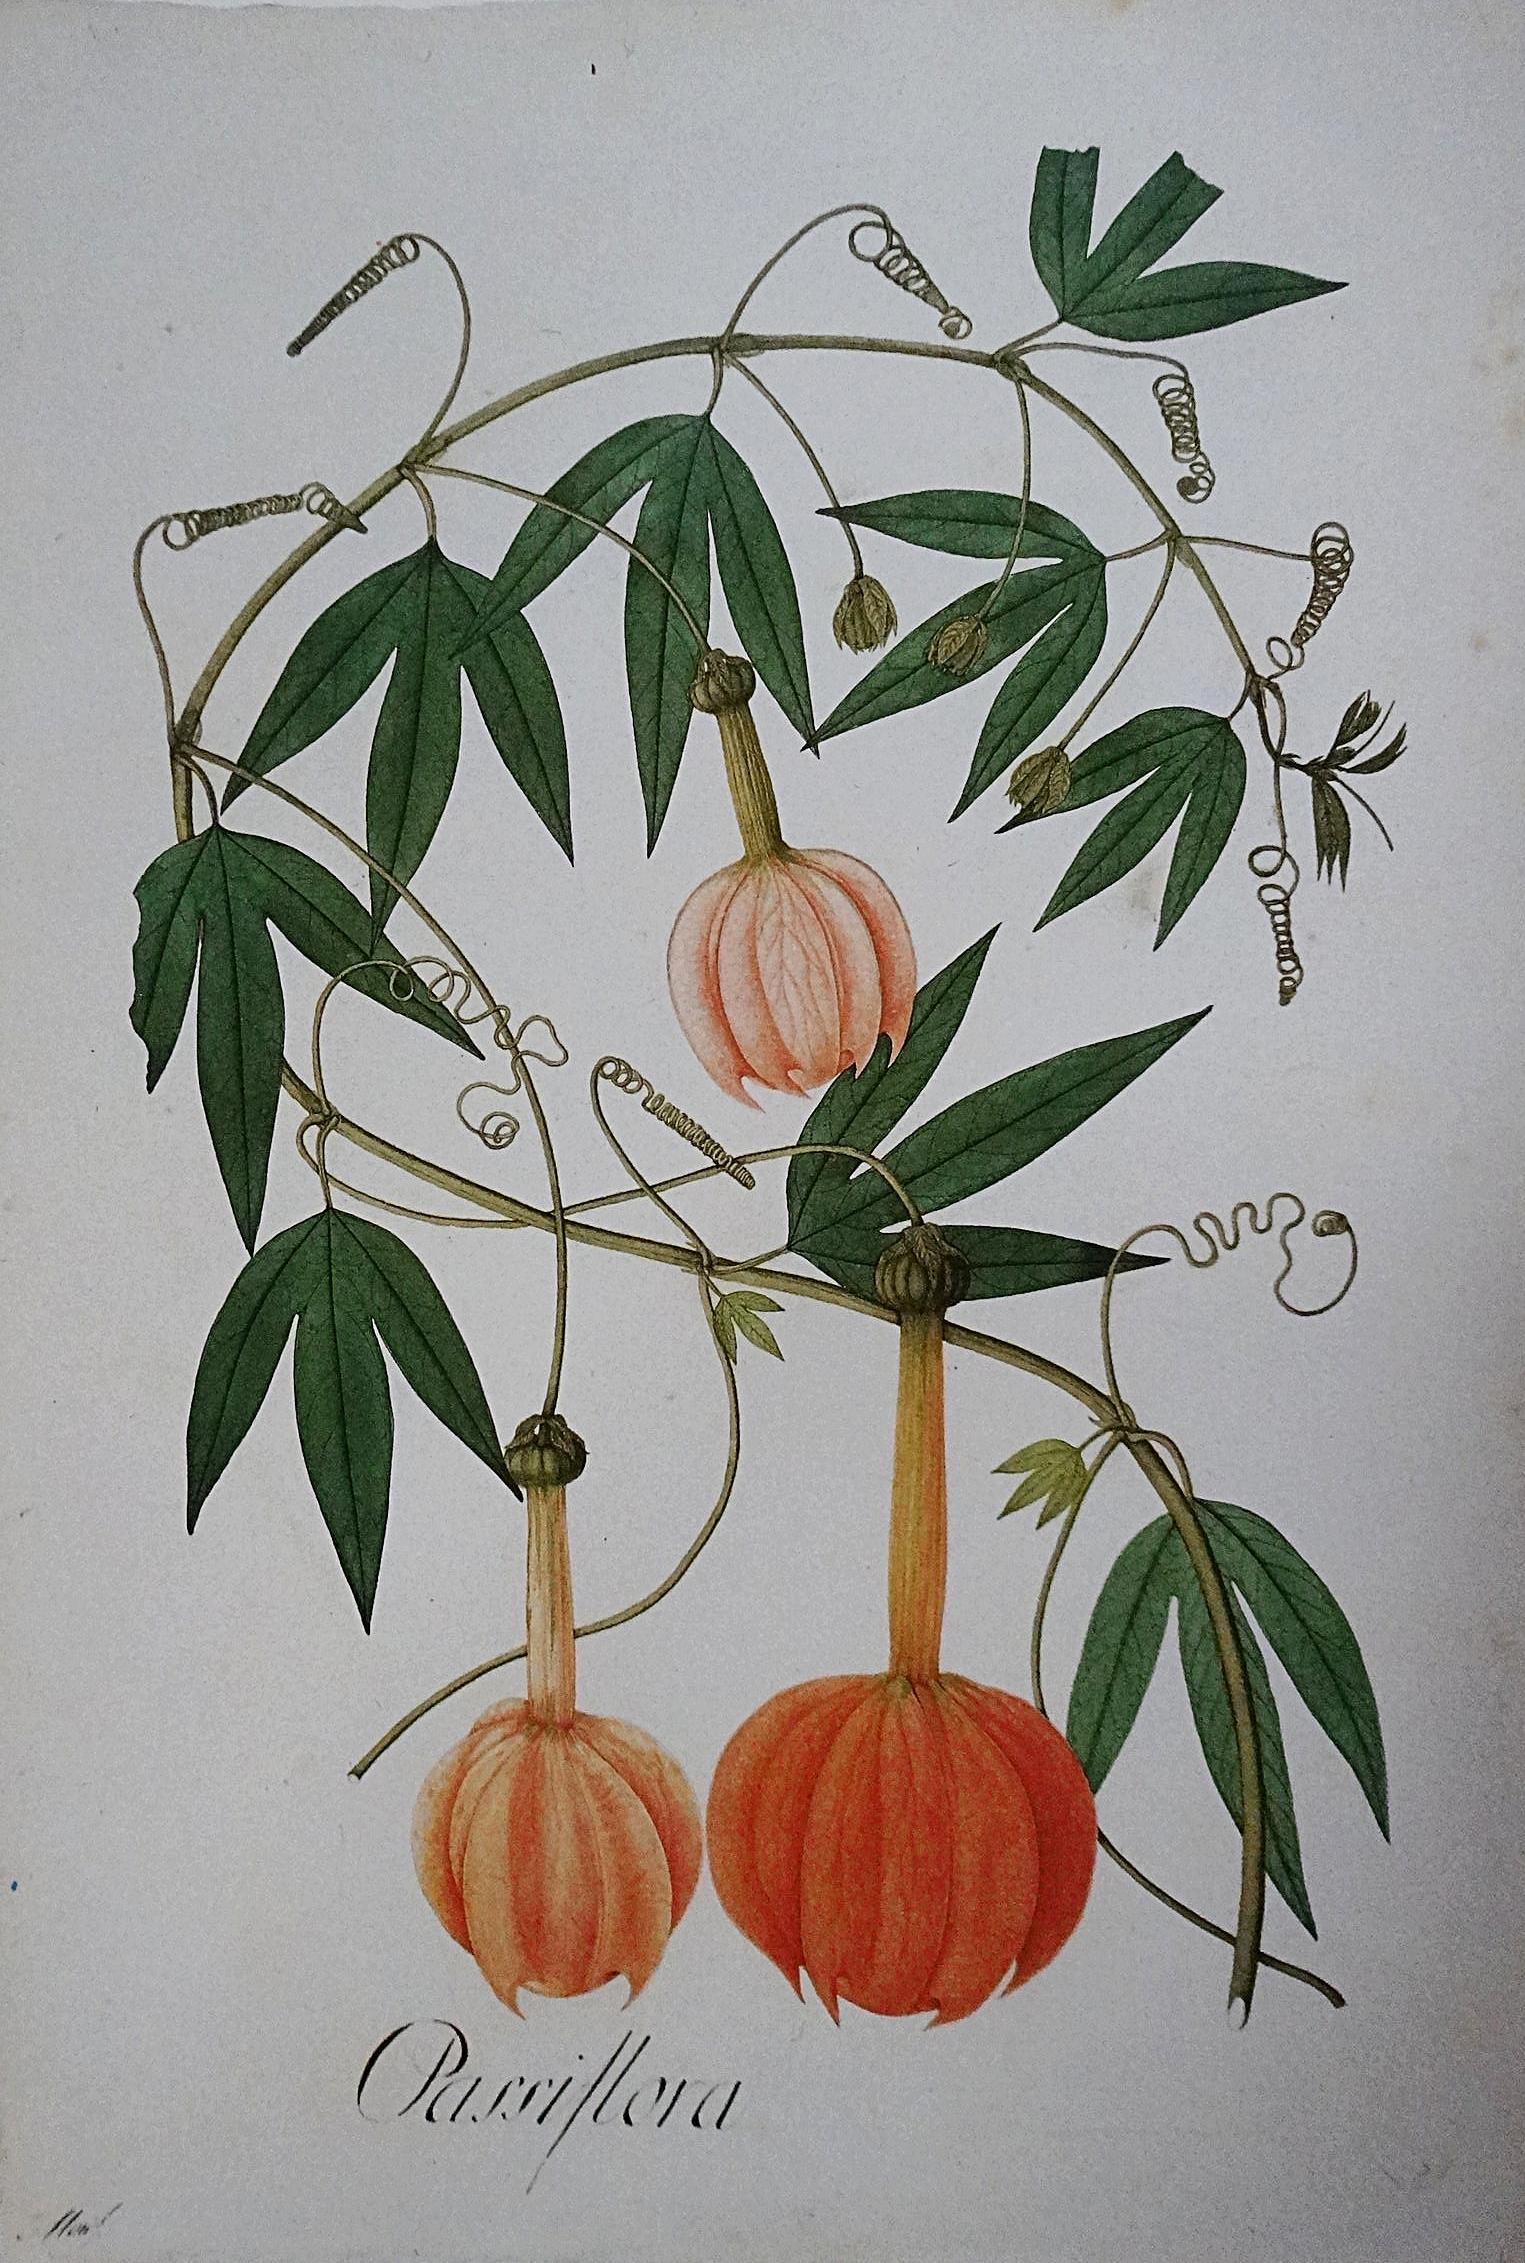 Passiflora parritae  by F. X. Matis (Image:  Archivo Real Jardín Botánico , Madrid, Spain).